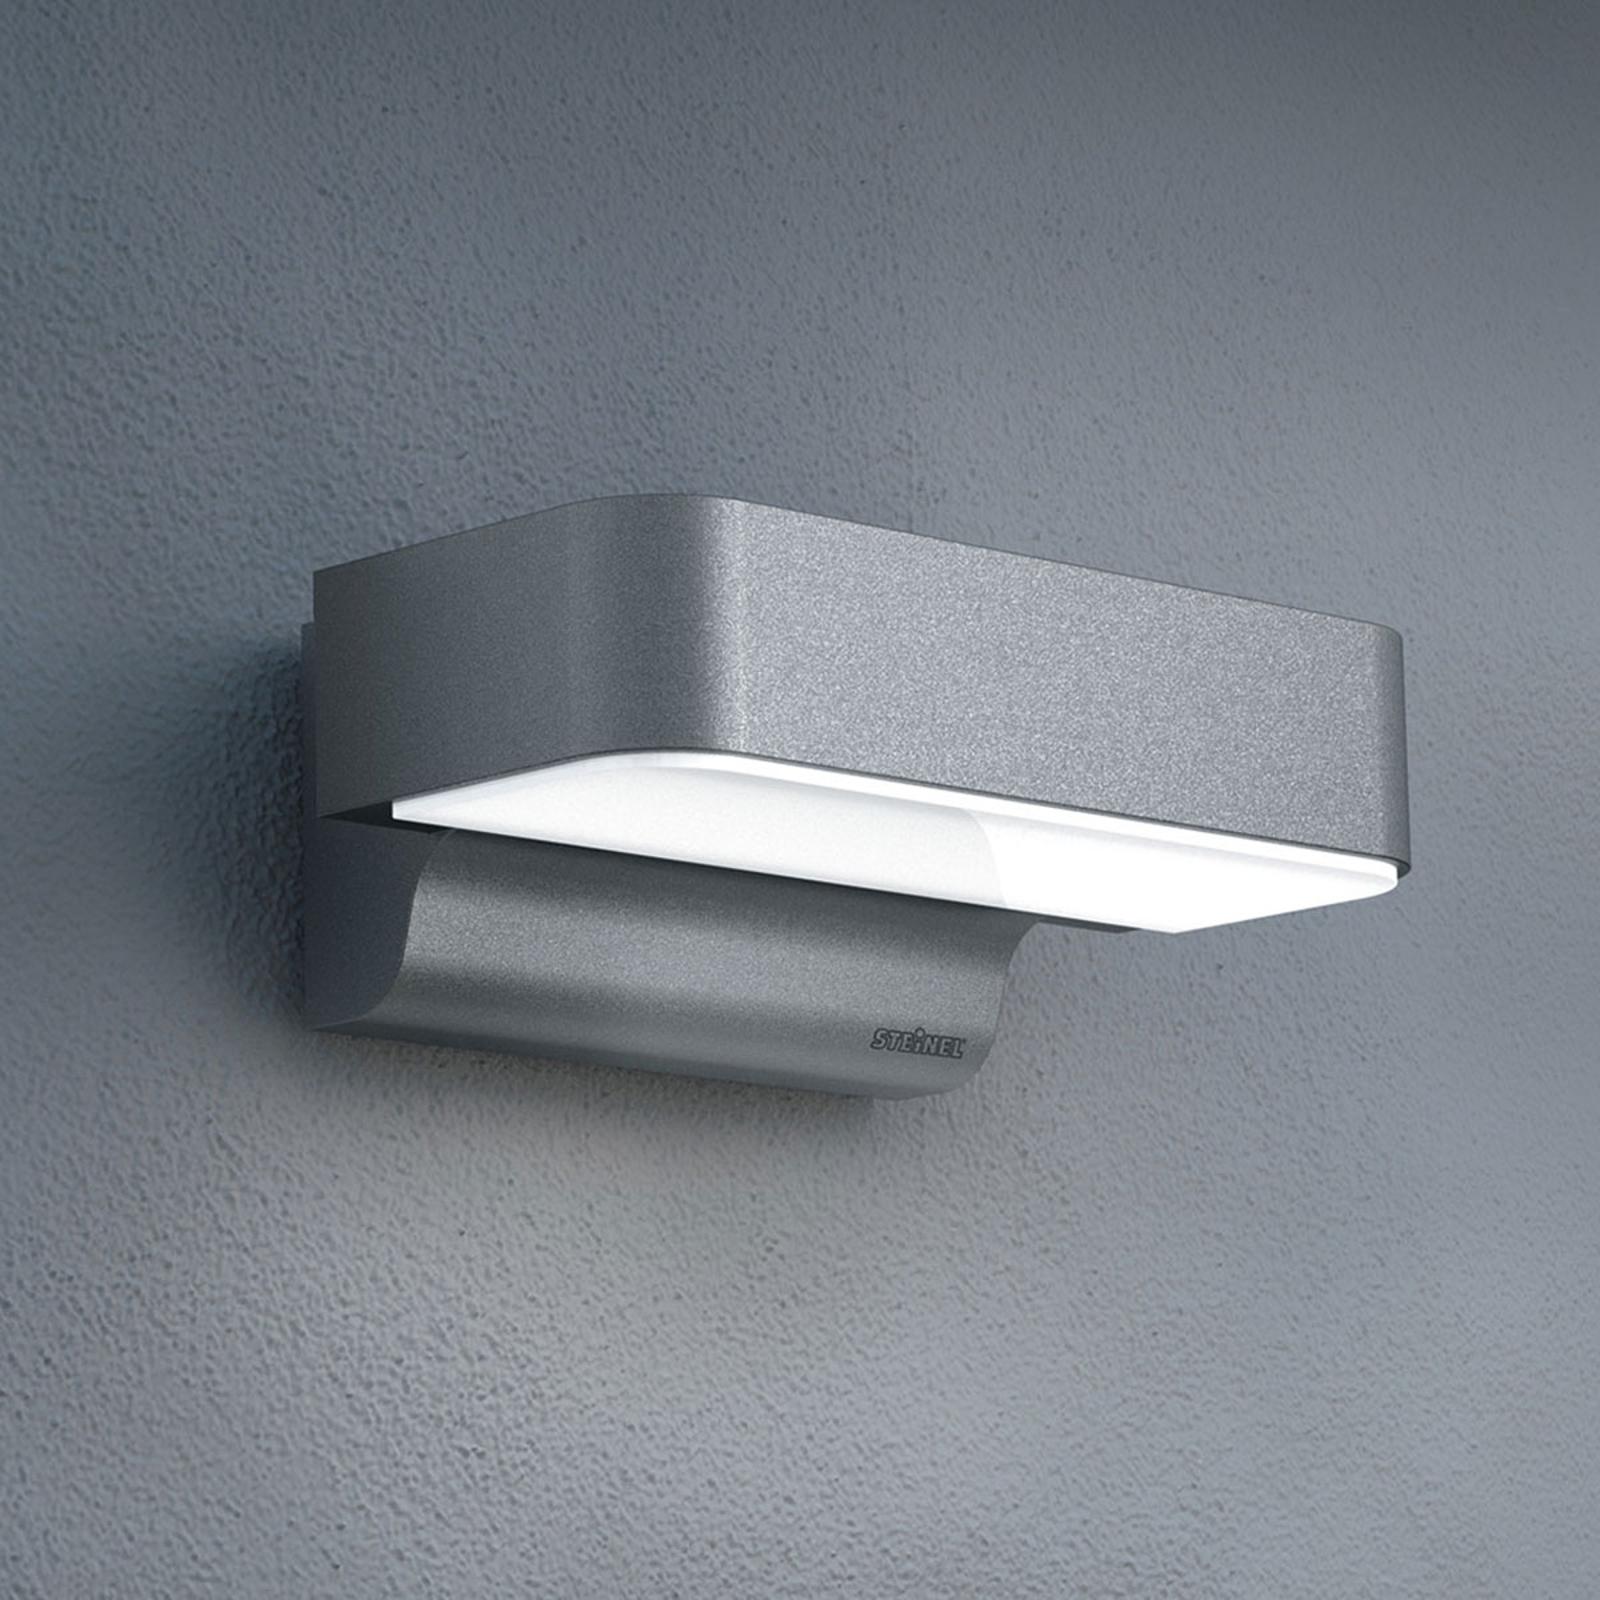 STEINEL L 800 LED iHF Connect lampa zewnętrzna